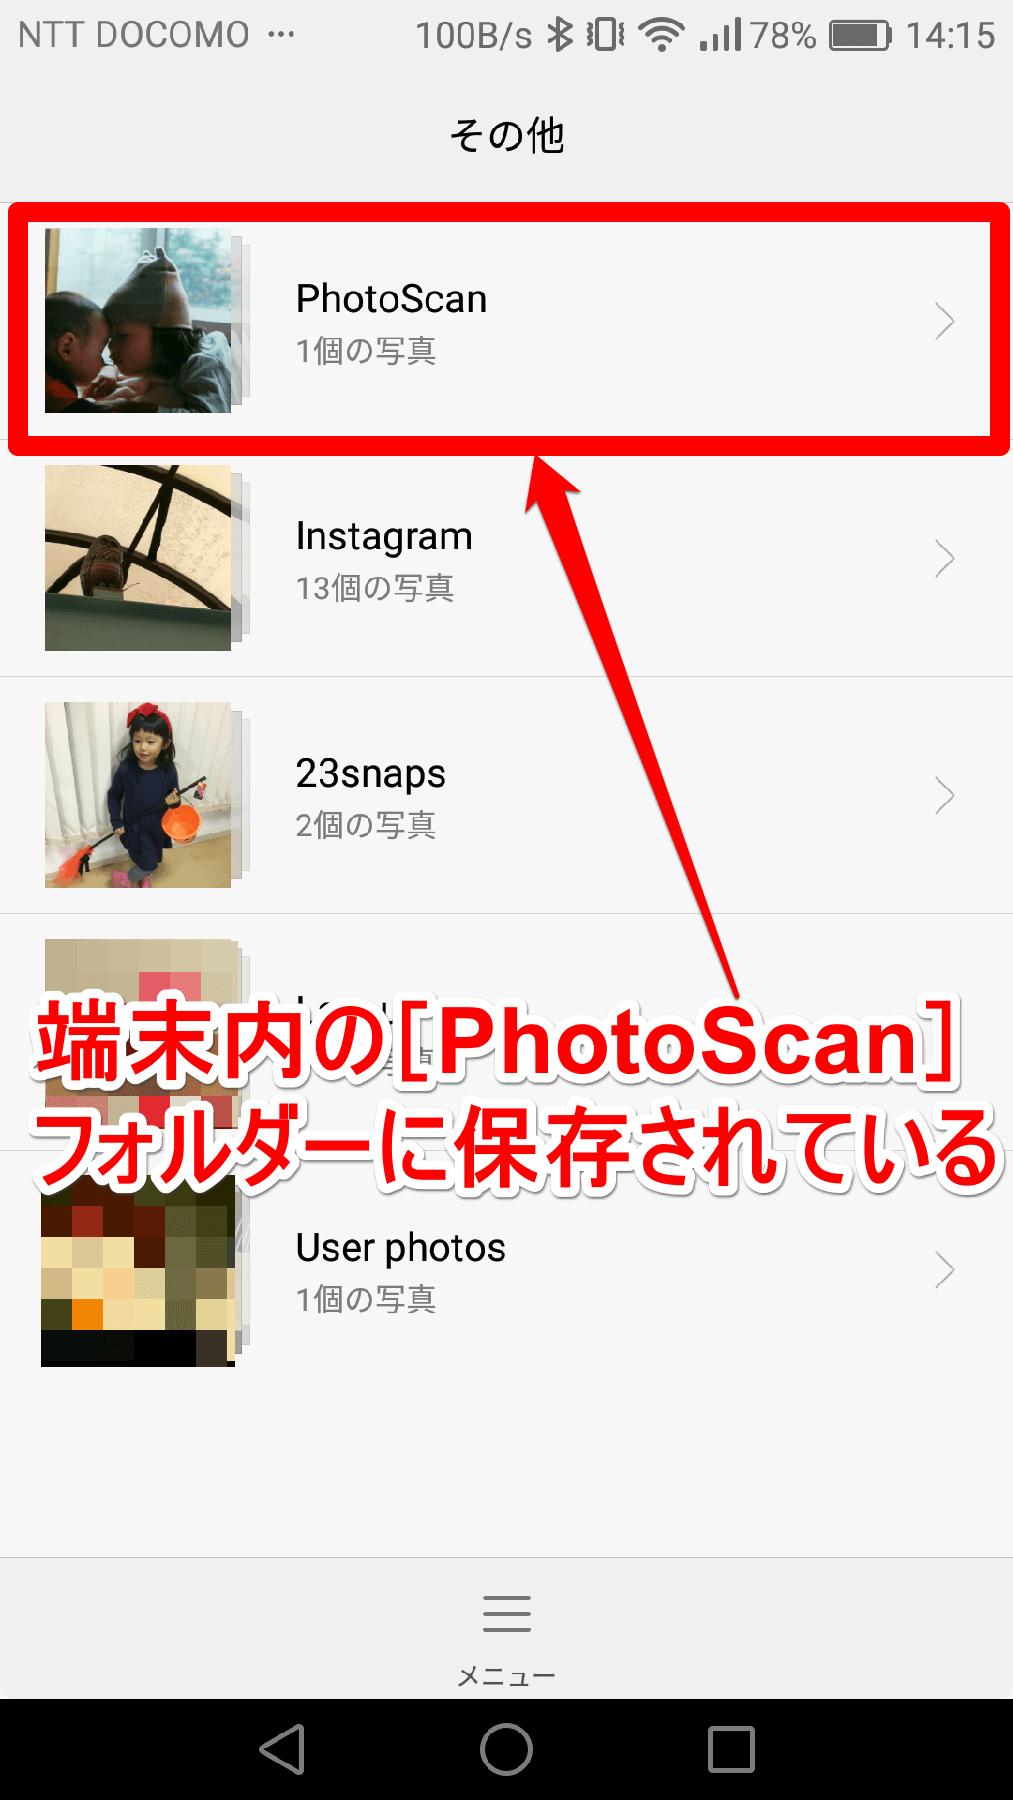 [PhotoScan]フォルダーの画面